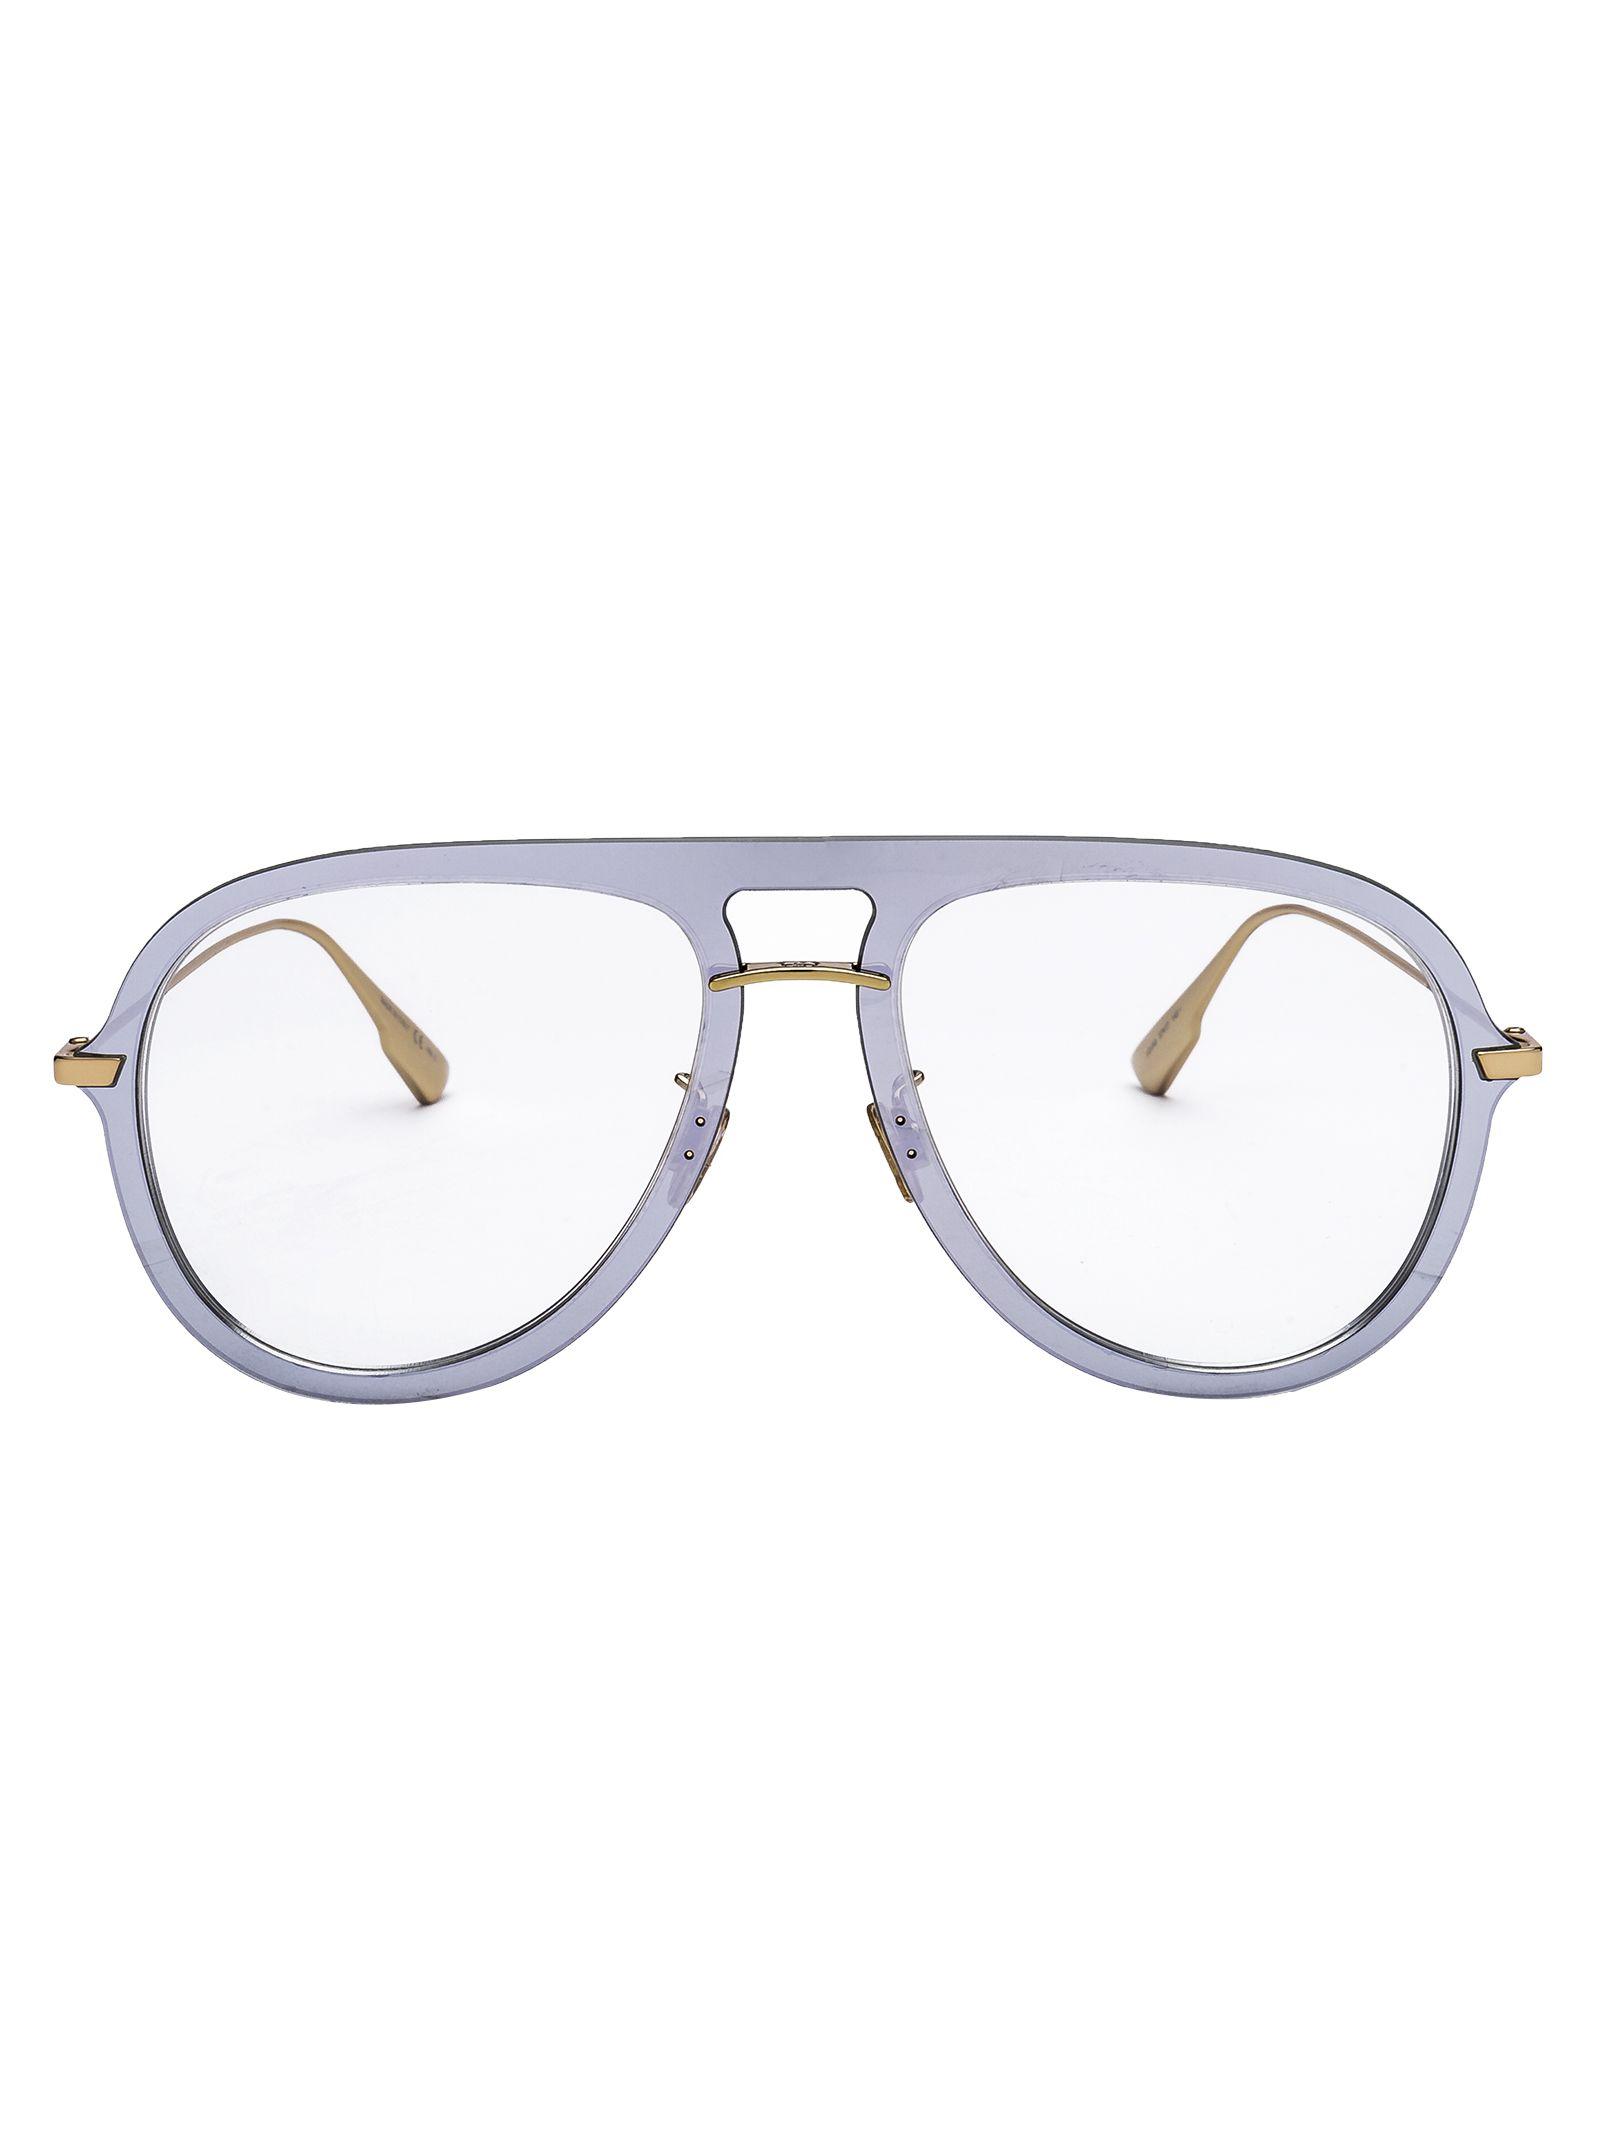 Dior Eyewear Aviator Glasses